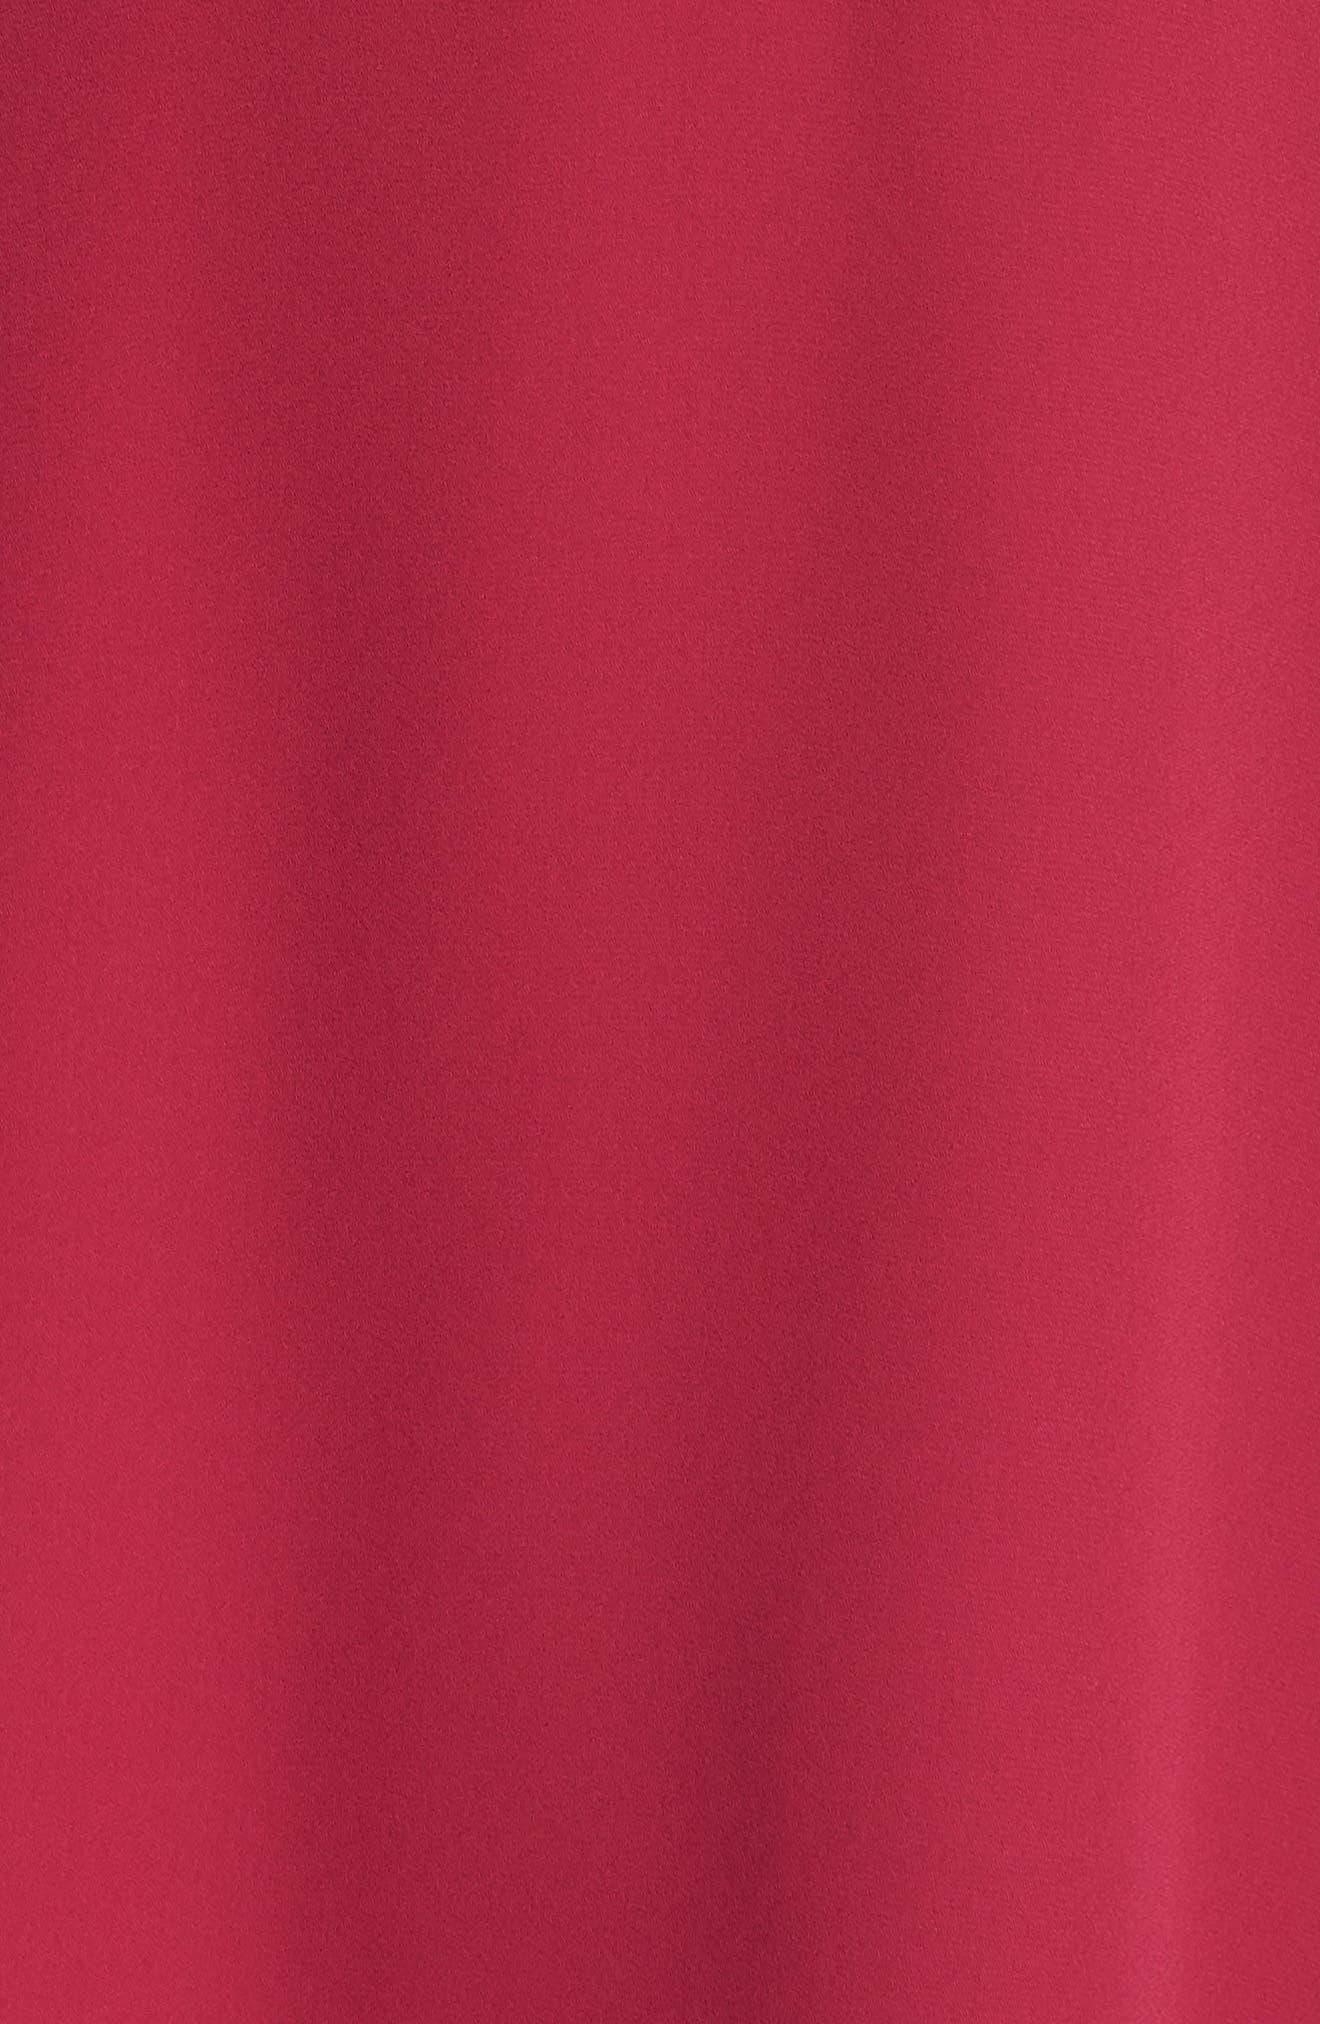 Trumpet Sleeve Dress,                             Alternate thumbnail 6, color,                             654